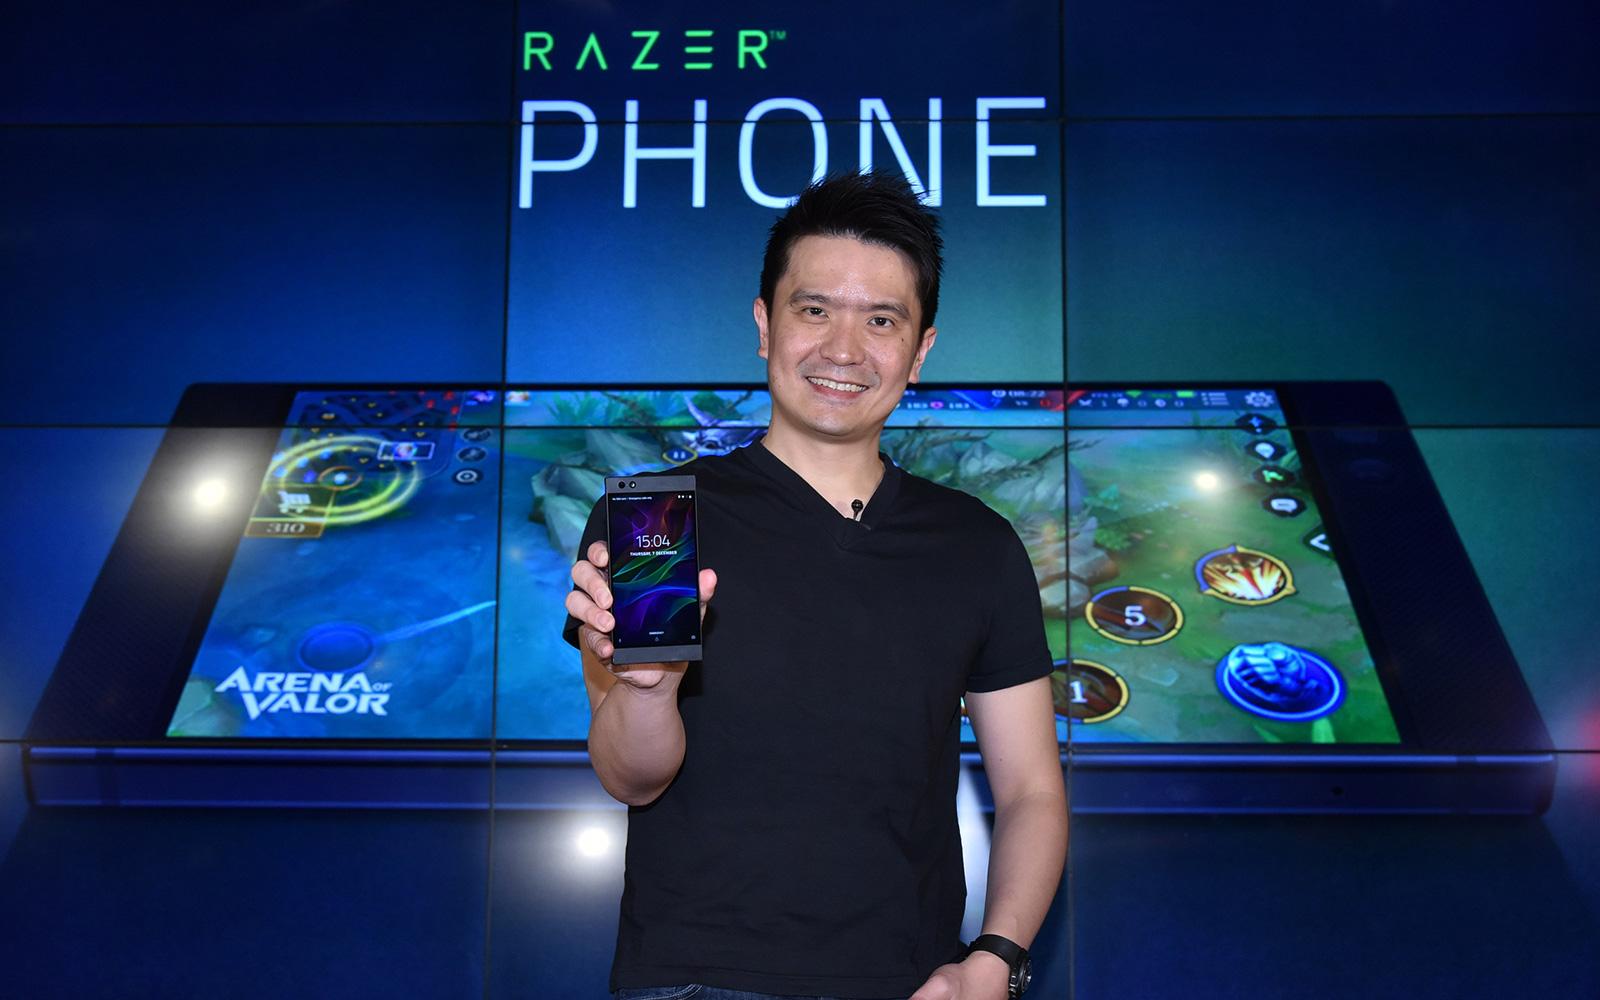 Razer CEO Min-Liang Tan holding a Razer Phone.